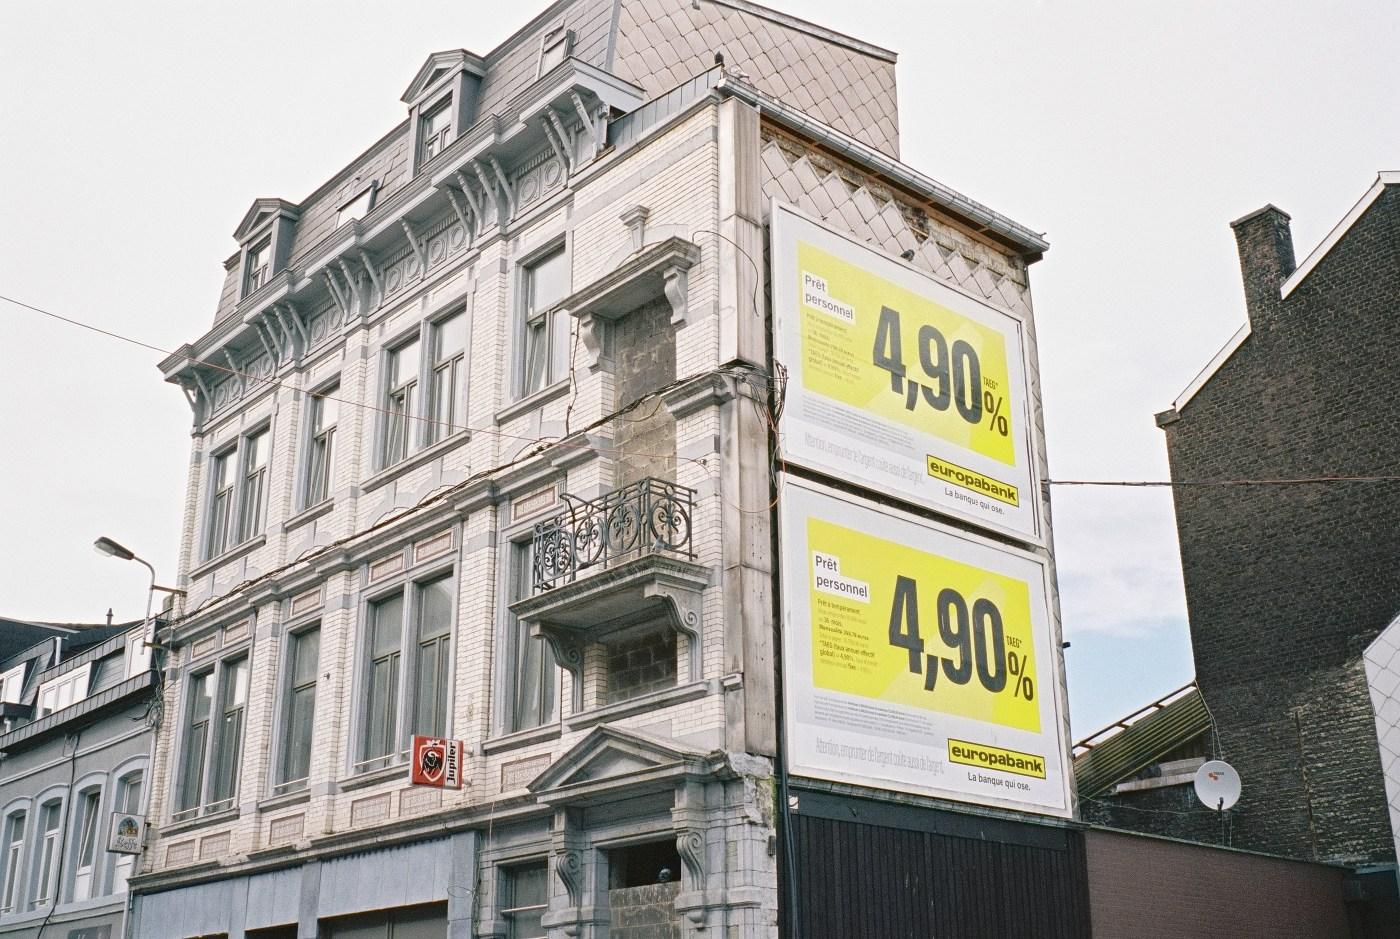 000023JoergBergs-KodakPortra400-MeinFilmLab-M7-35